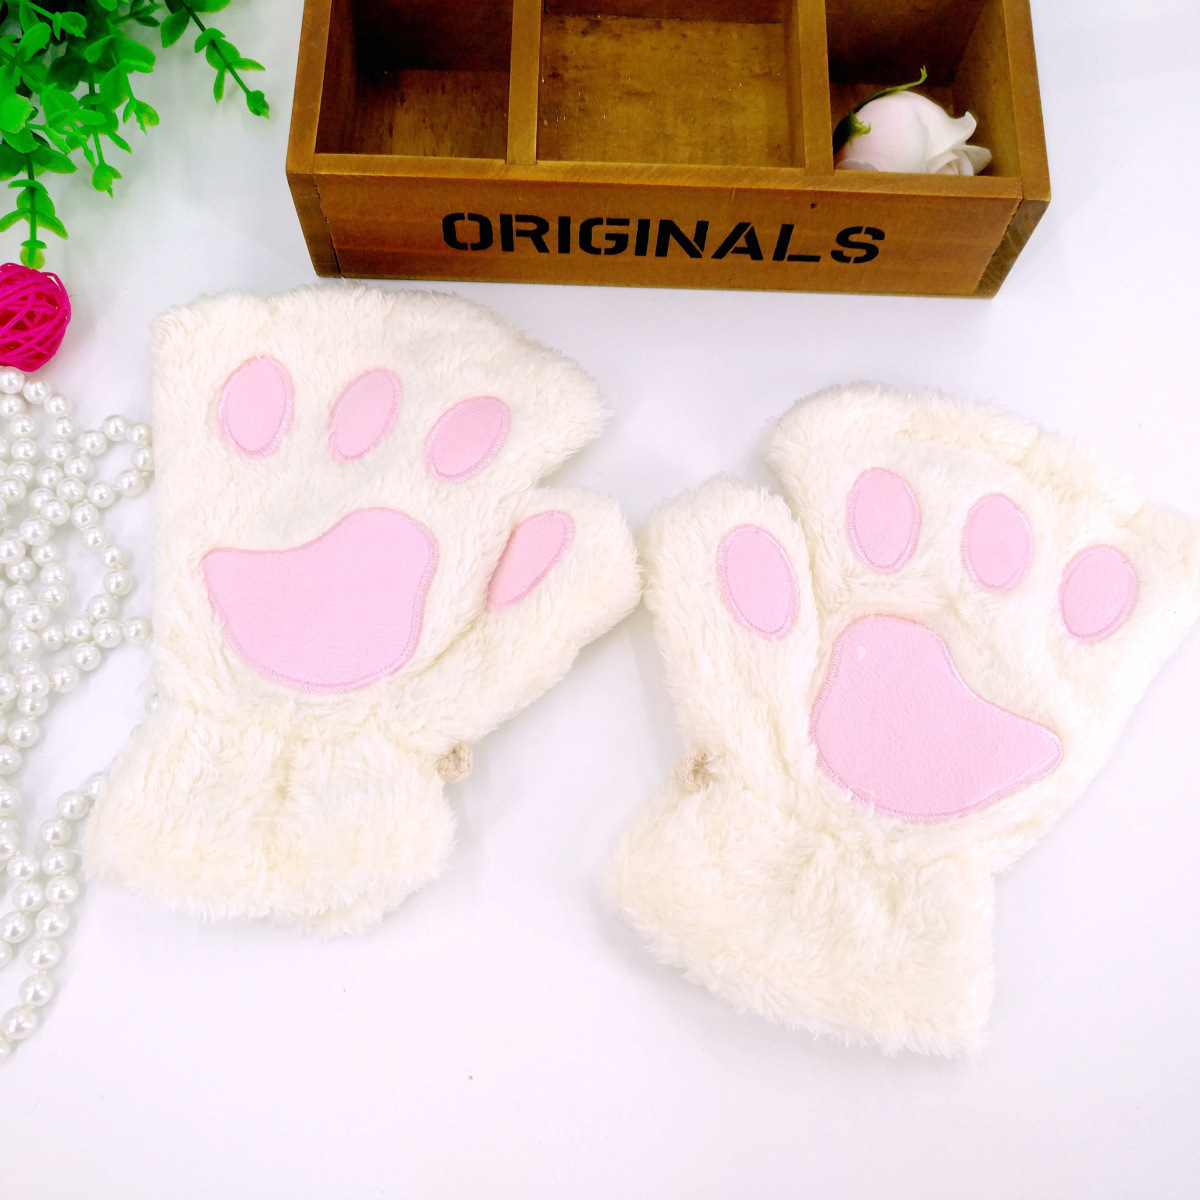 Mitten Soft Full Finger Gloves Fashion Winter Warmer Adults Boy Girl Cat Fingerless Hand Cute Cat Claw Paw Plush Gloves